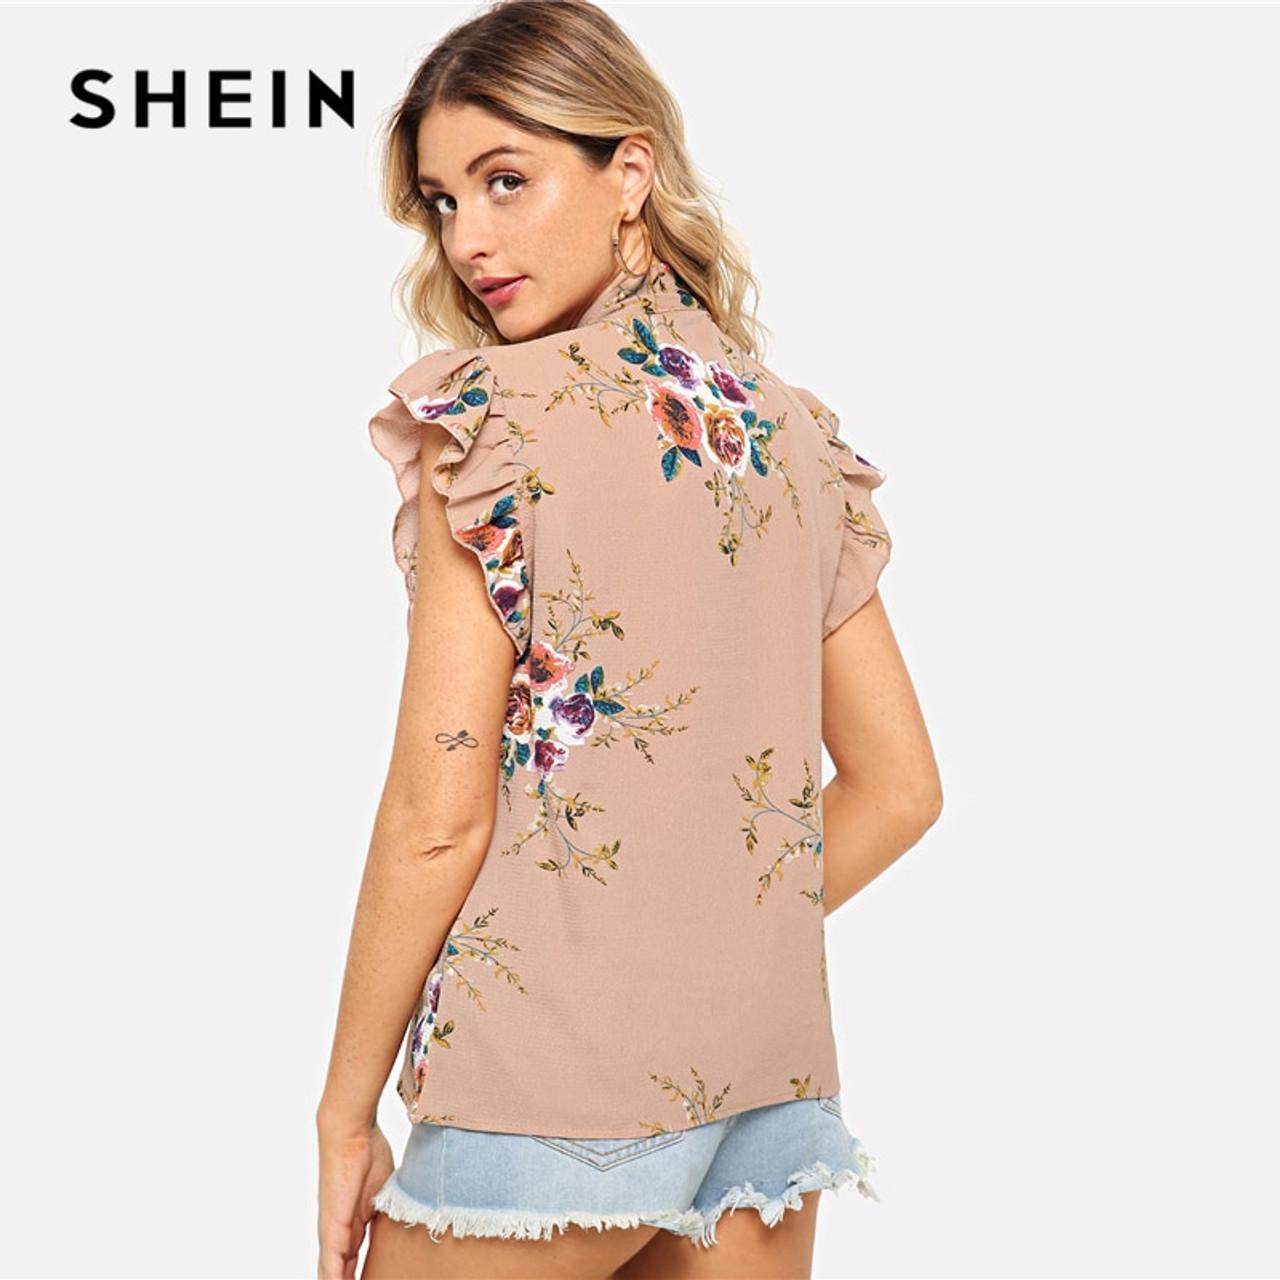 5a675fc5d4301c ... SHEIN Flounce Shoulder Tied Neck Floral Blouse Pink Ruffle Sleeveless  Chiffon Blouses Women Summer Casual Elegant ...